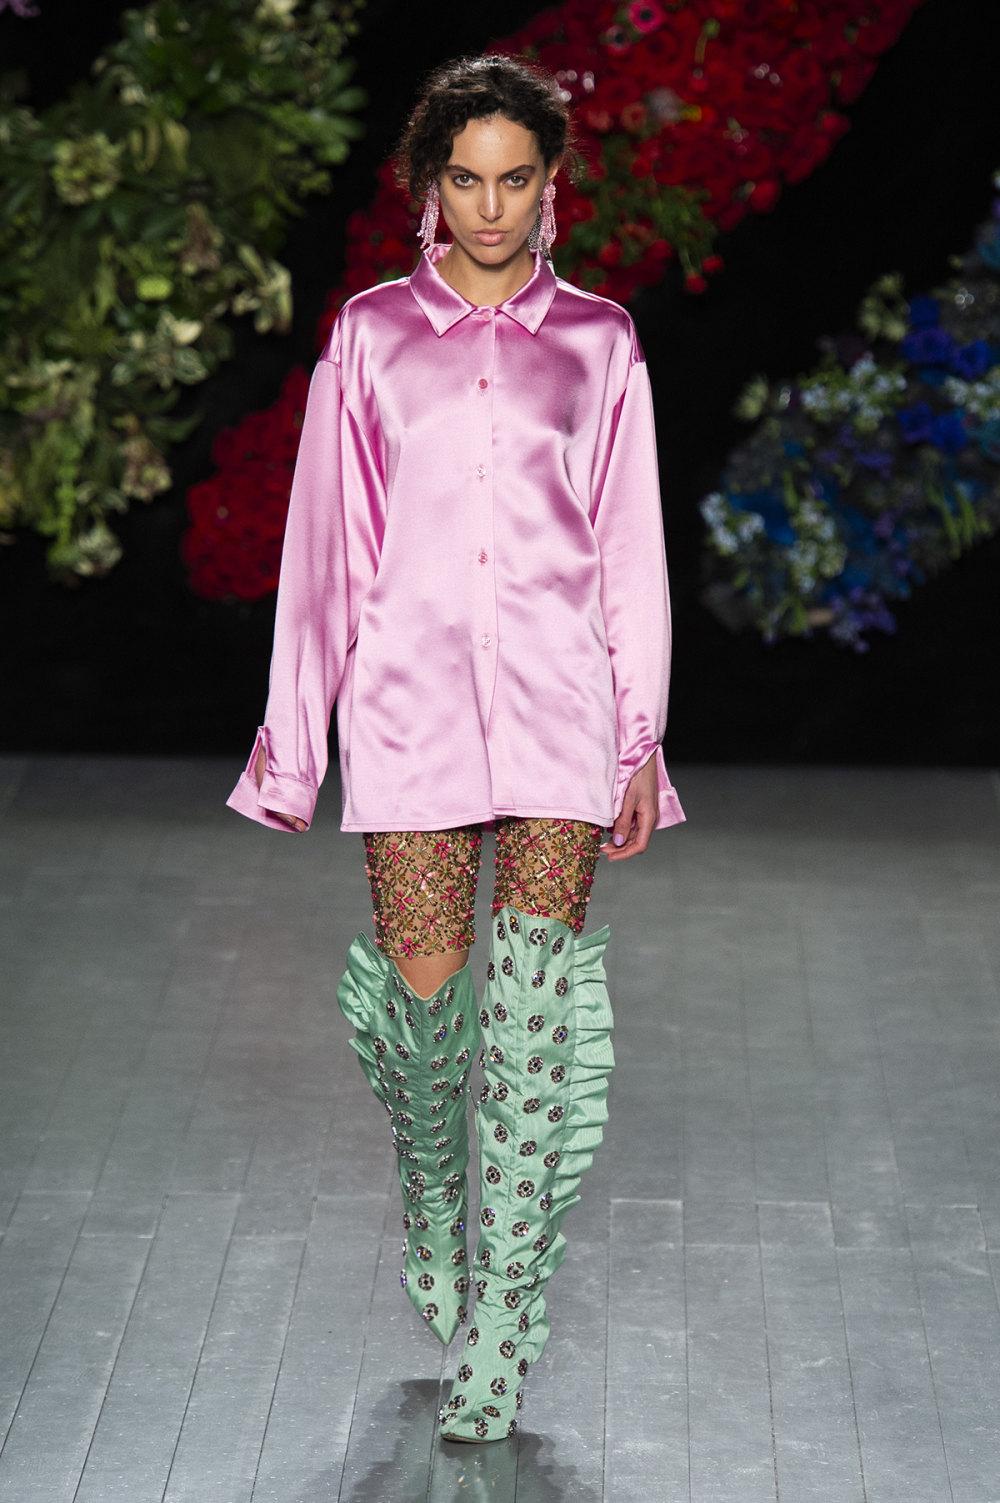 Roberta Einer时装系列格子呢西装外套收紧腰部霓虹色腰带连帽衫-26.jpg